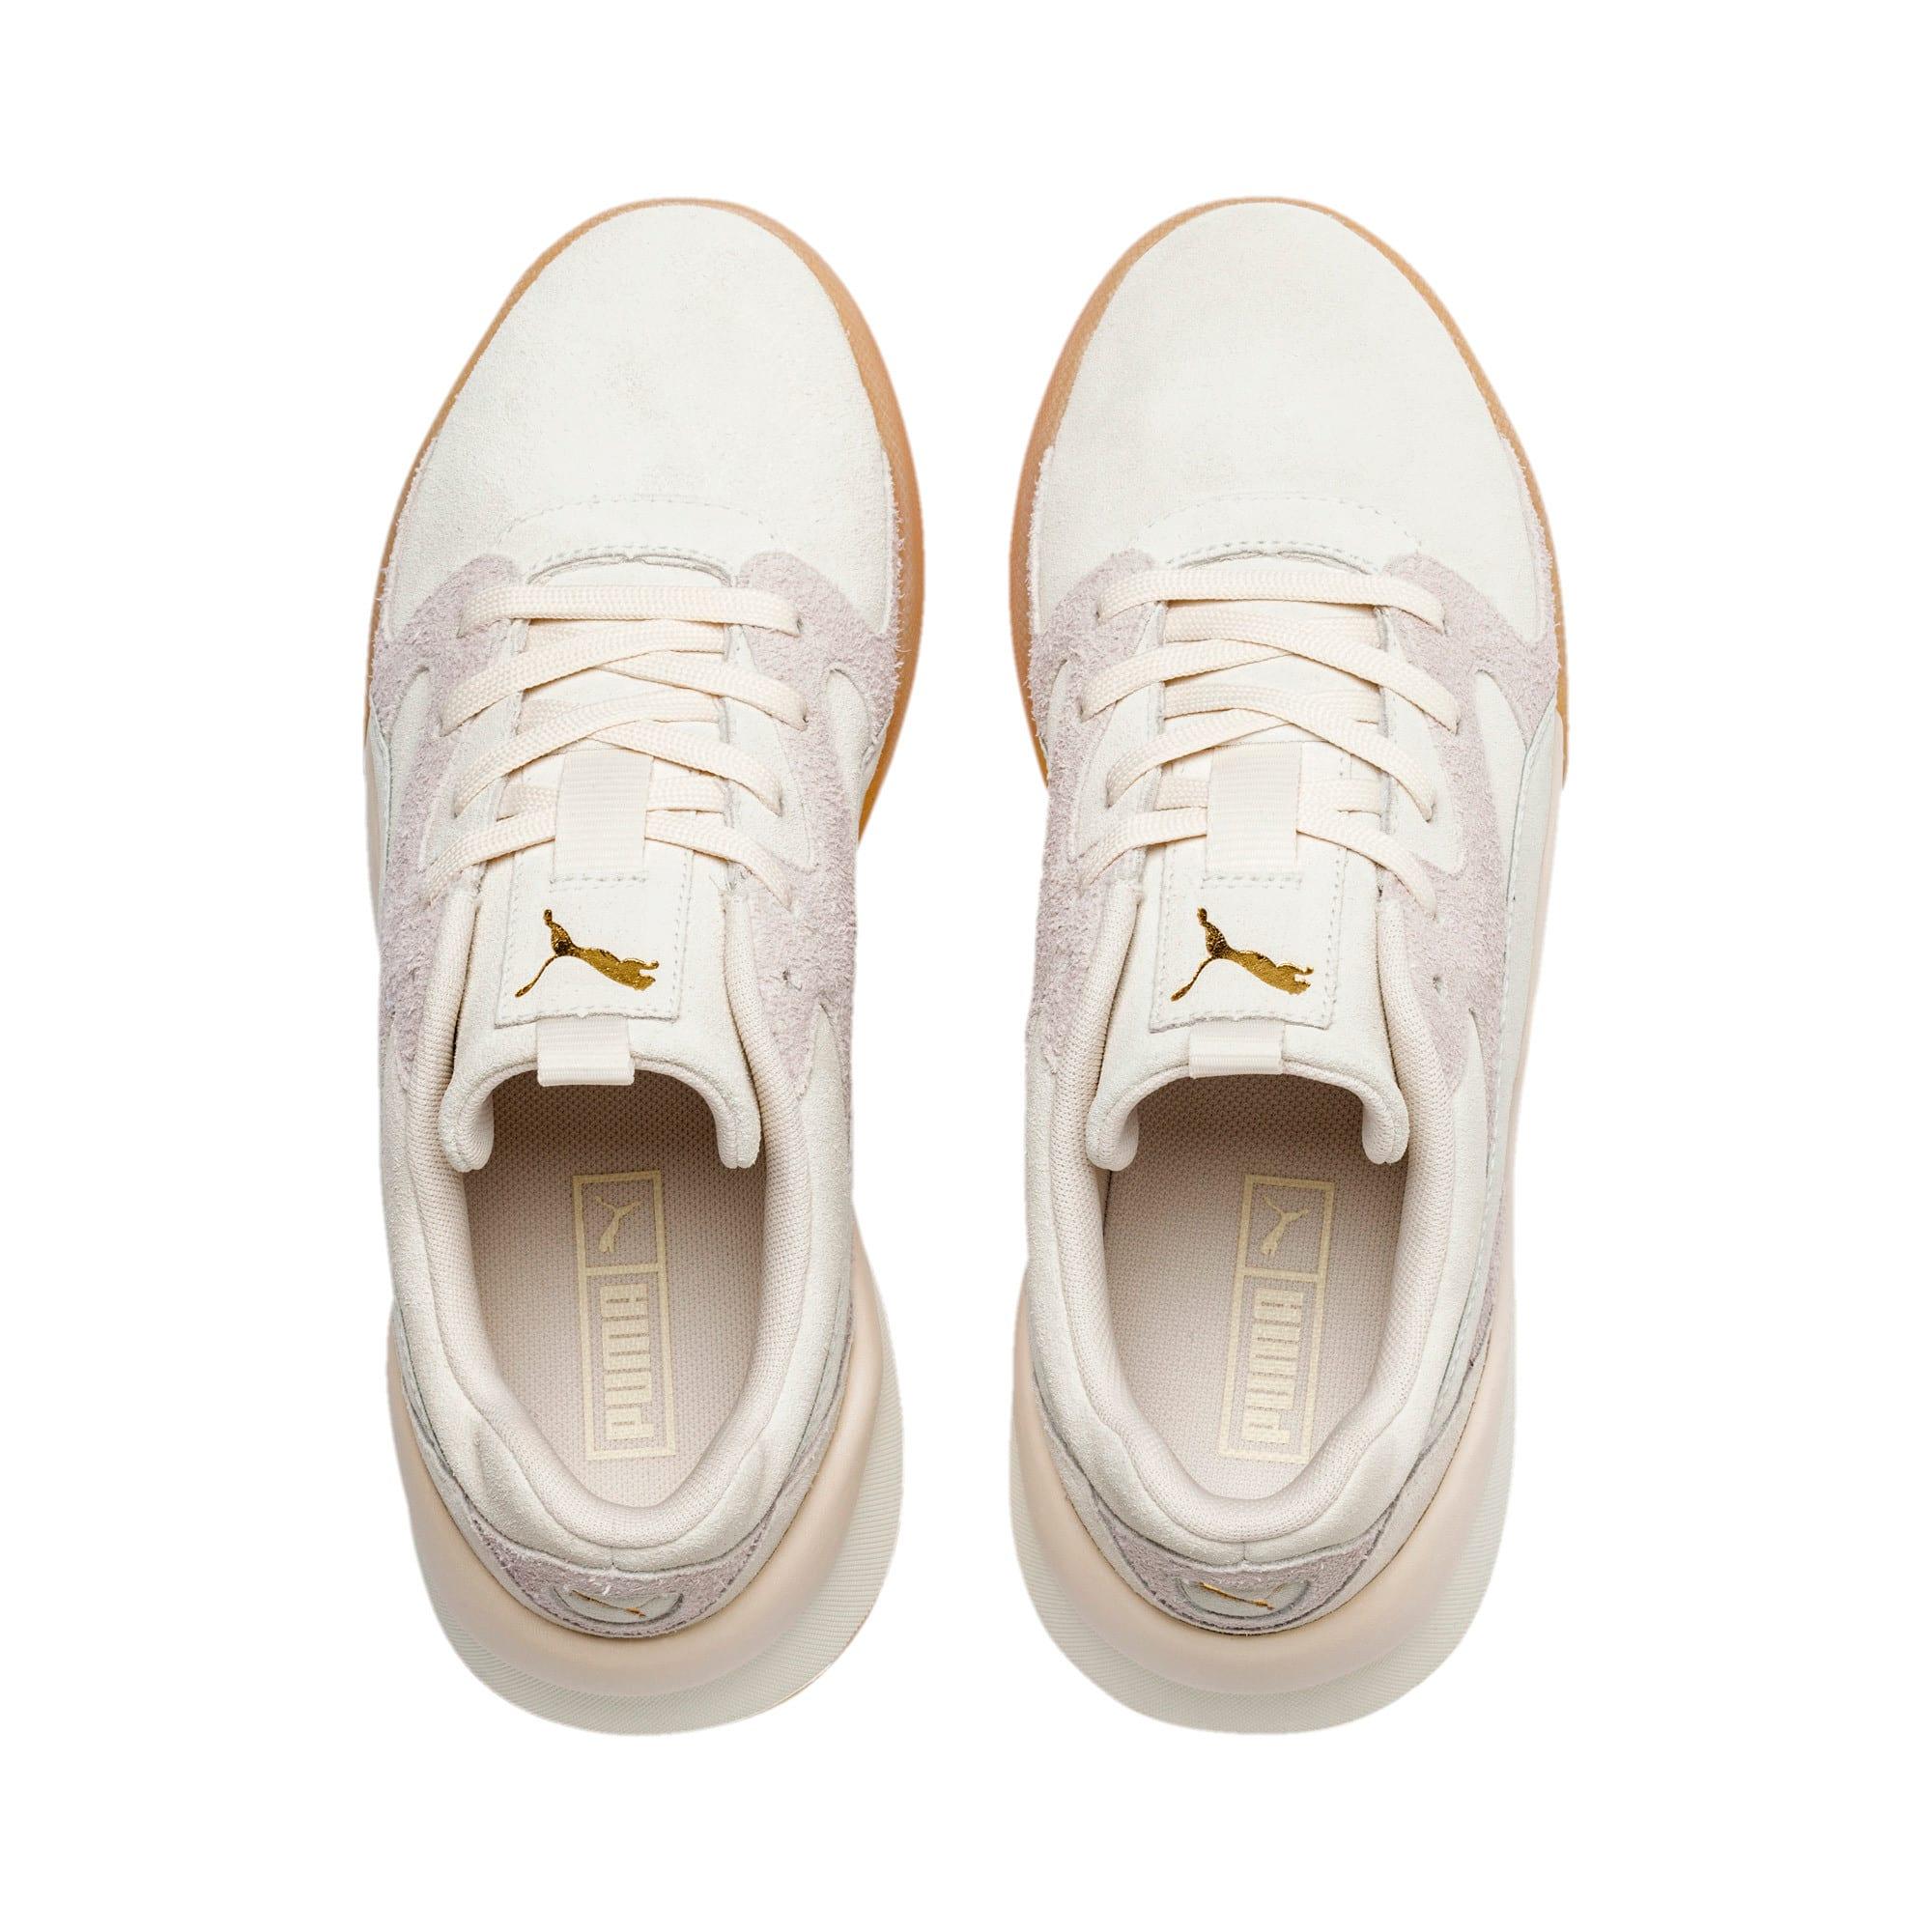 Thumbnail 7 of Aeon Rewind Women's Sneakers, Pastel Parchment, medium